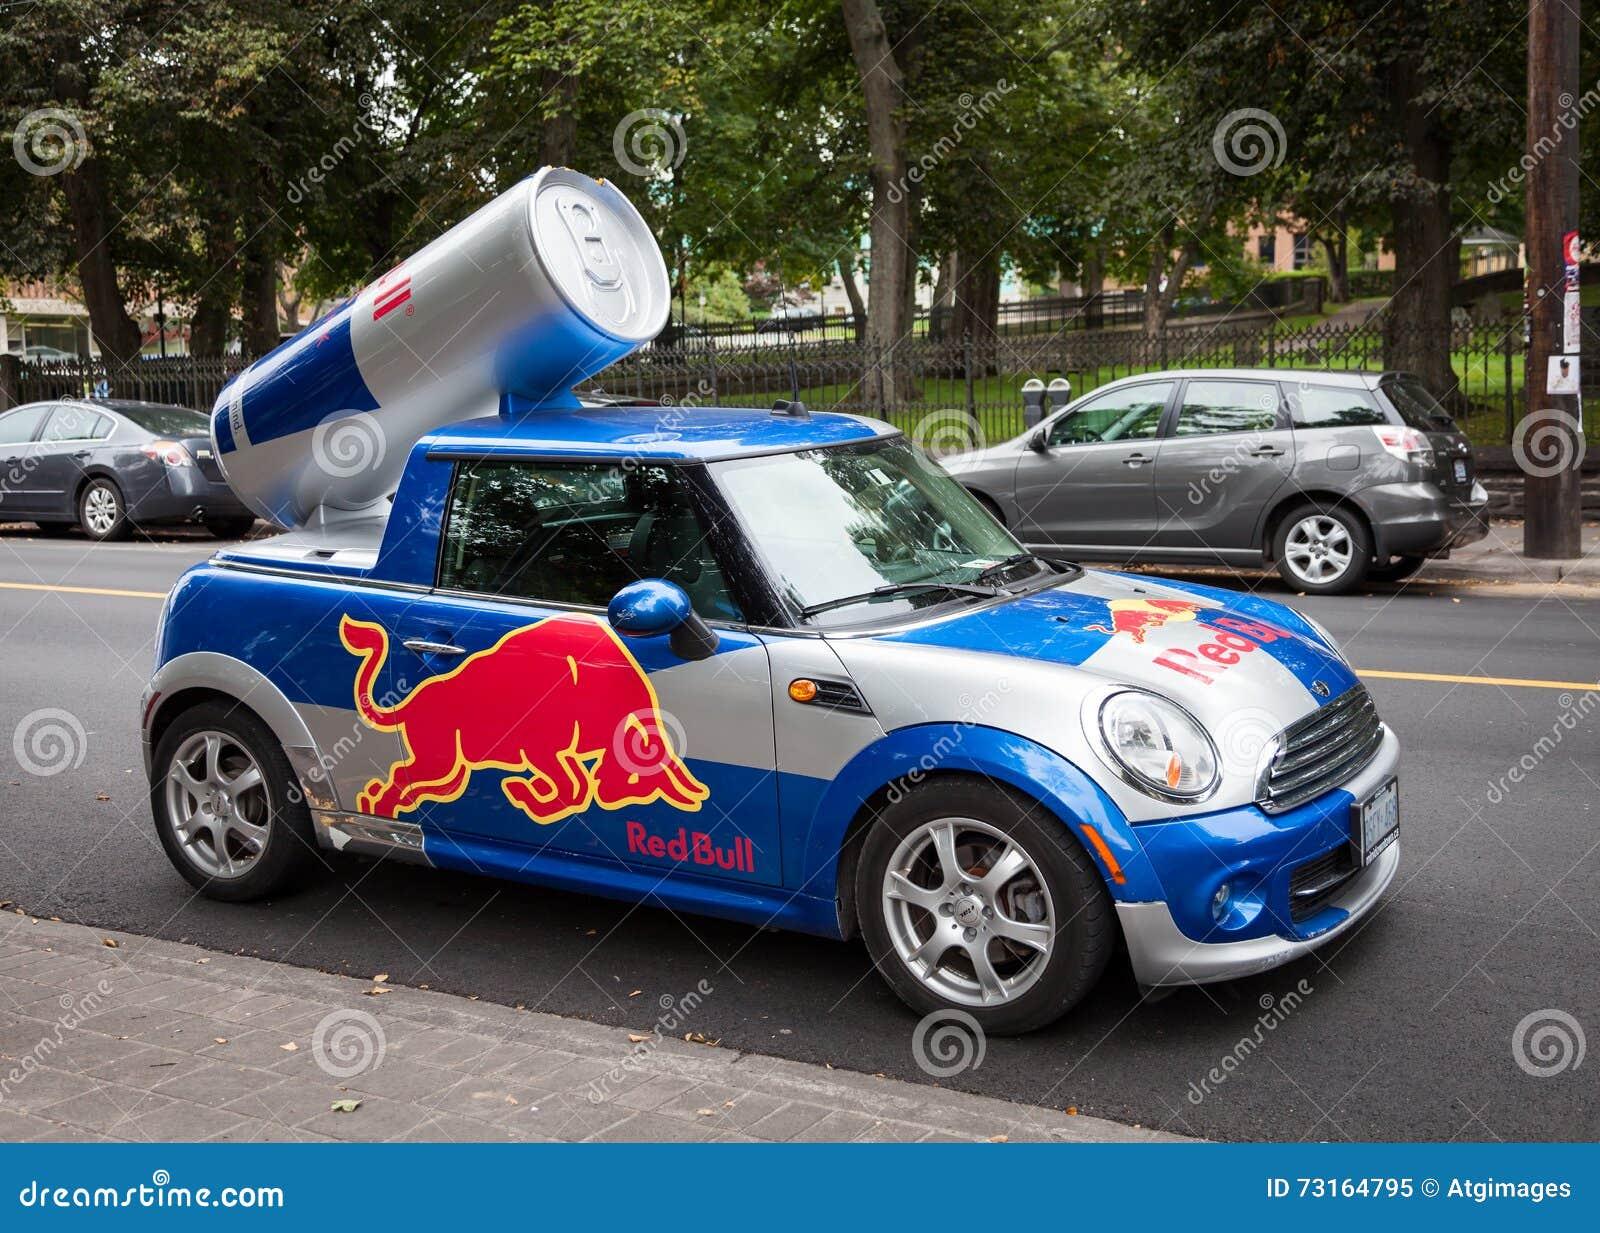 Red Bull Auto